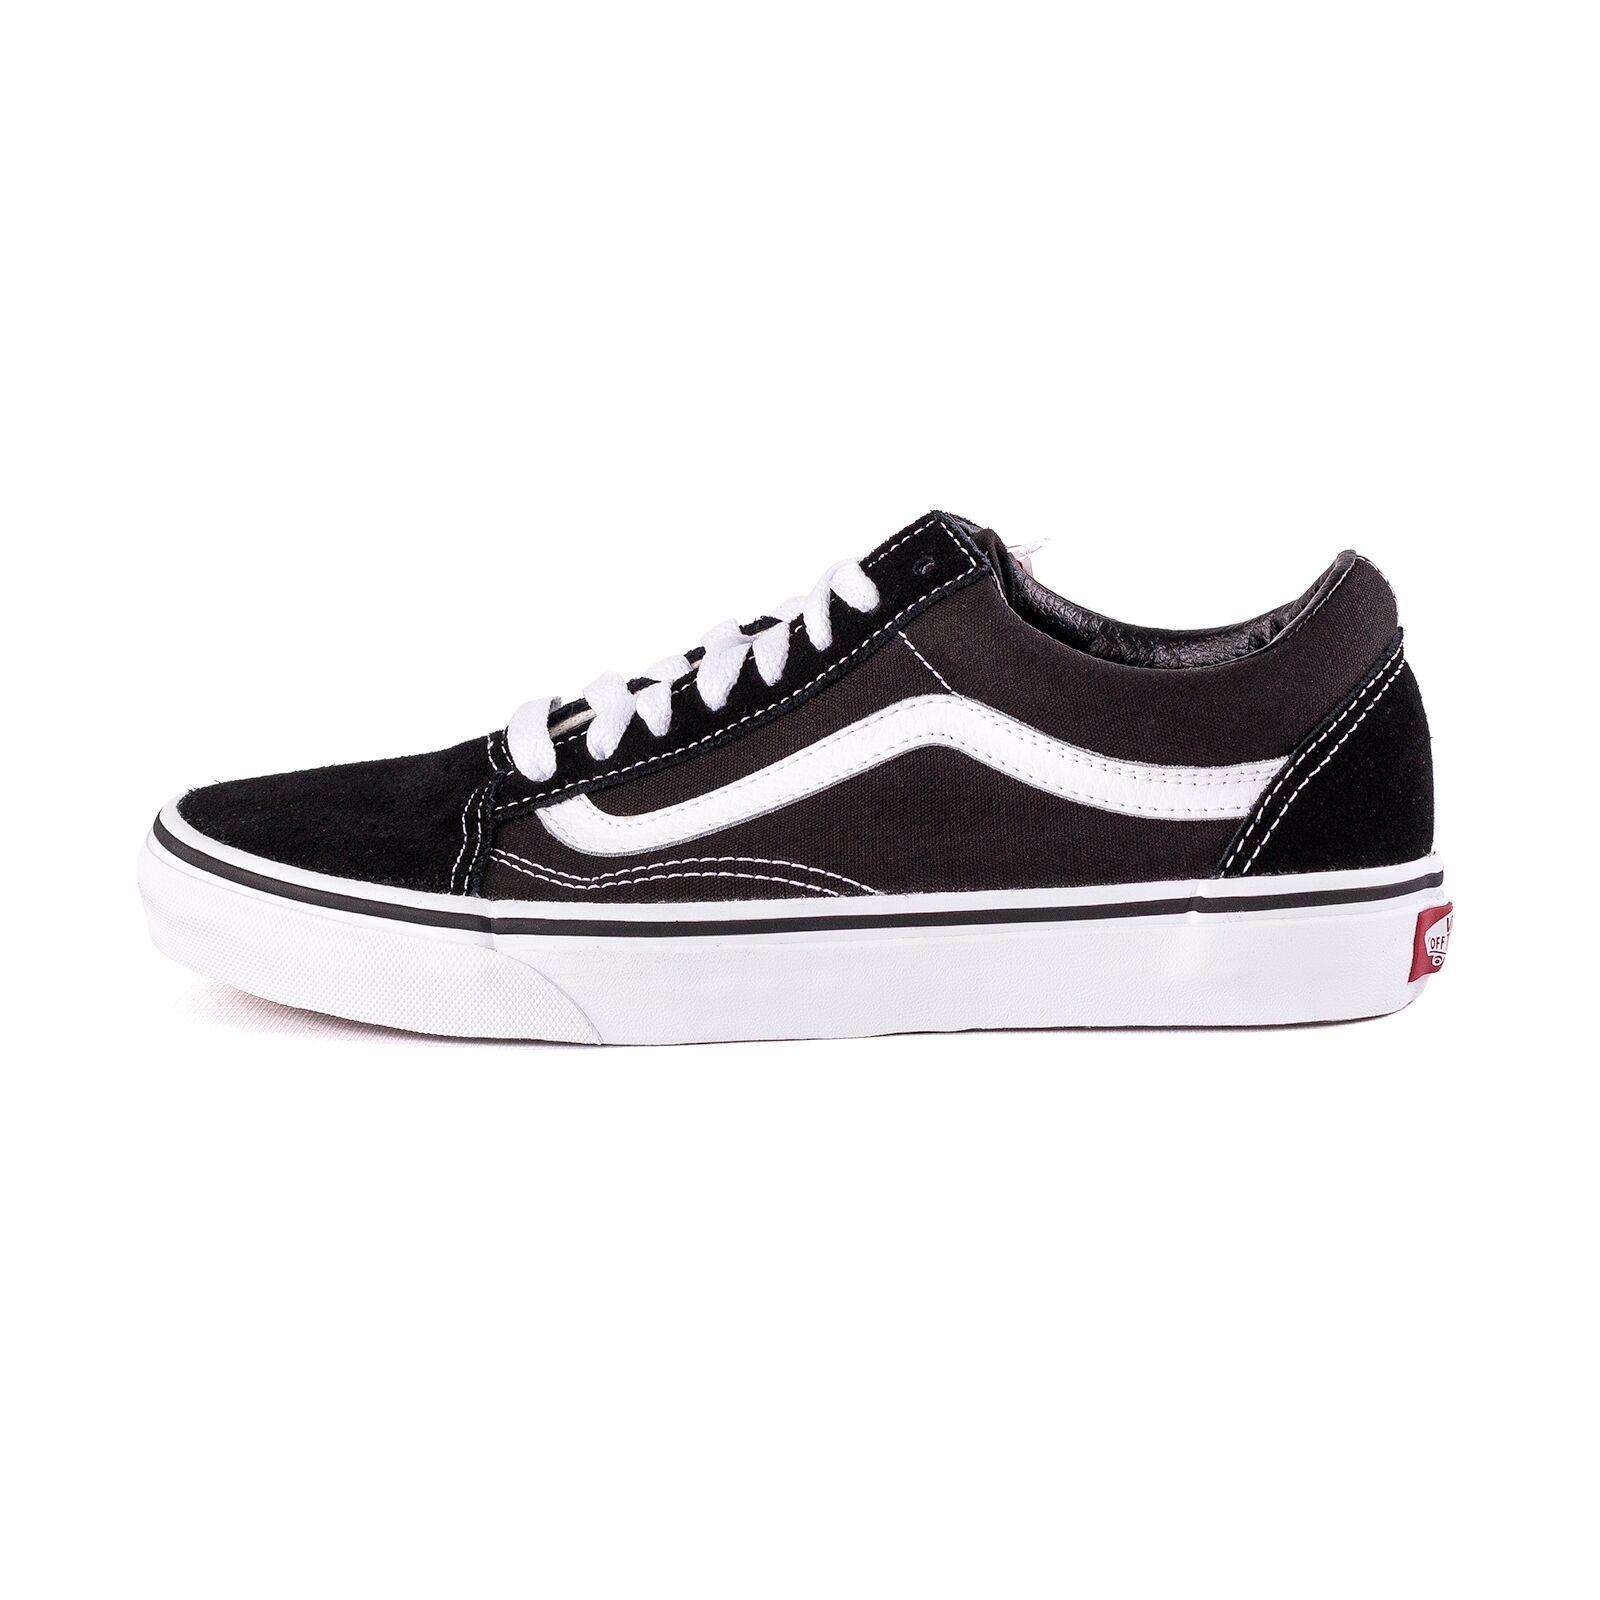 Vans Old Skool Schuhe unisex Sneaker, Farbe schwarz/weiß, 51072